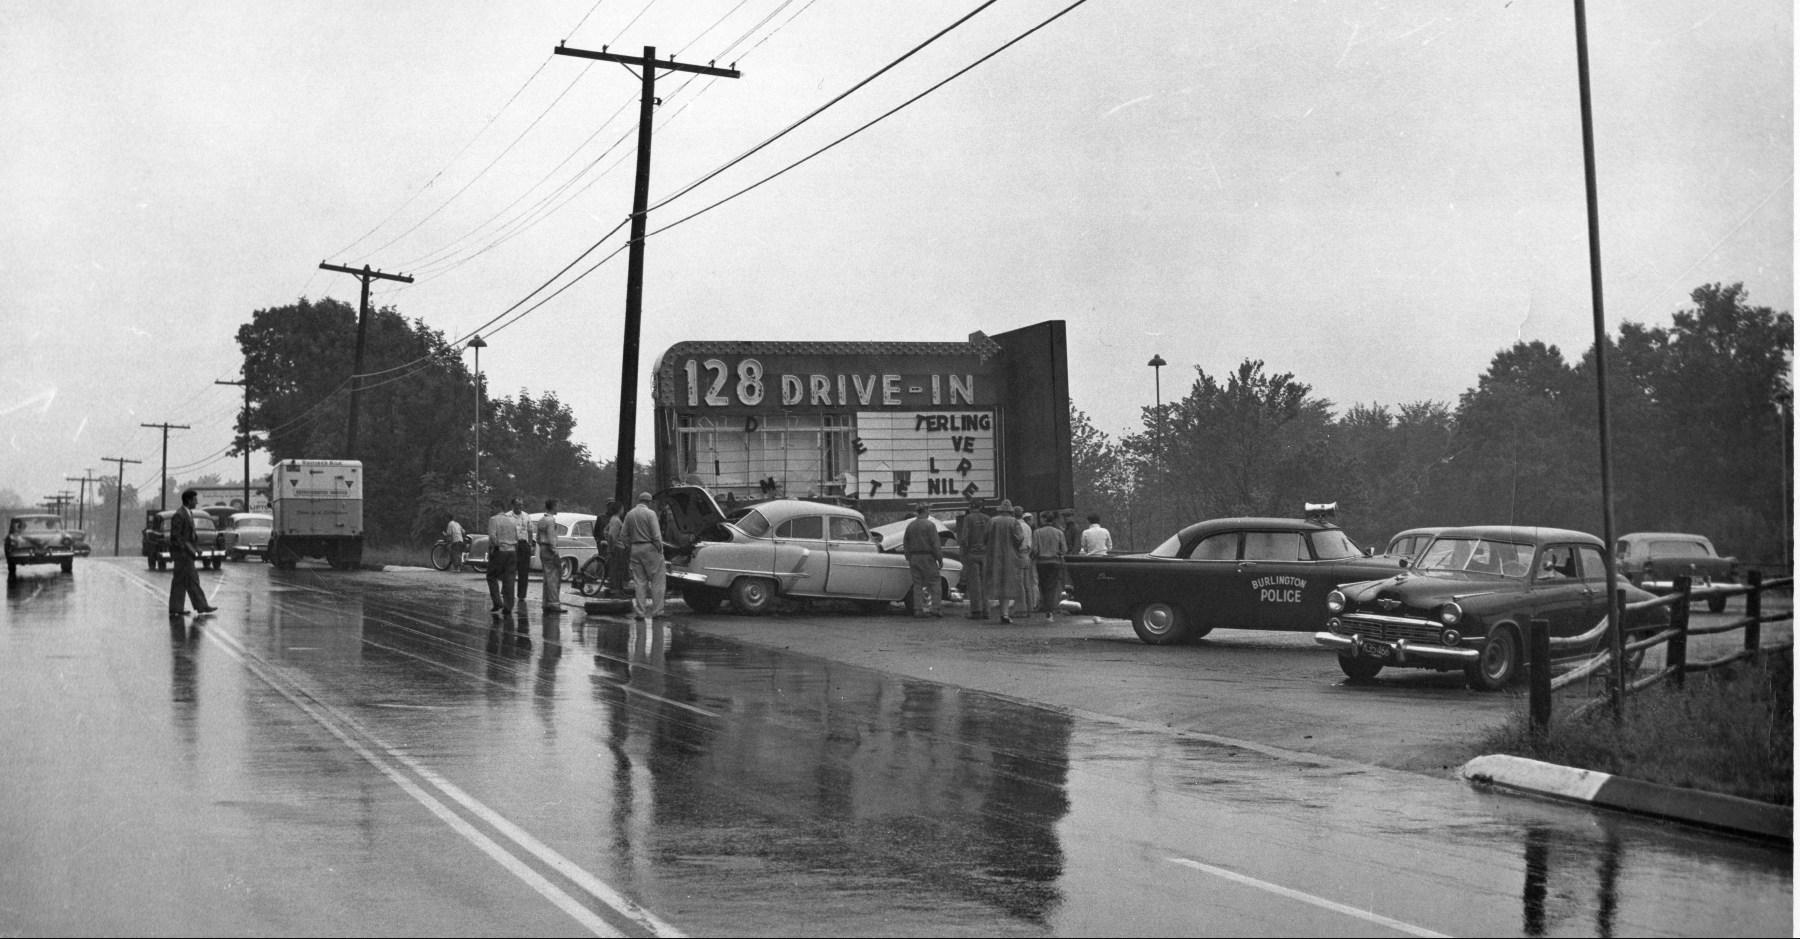 128 Drive-in entrance, Burlington, MA 1956